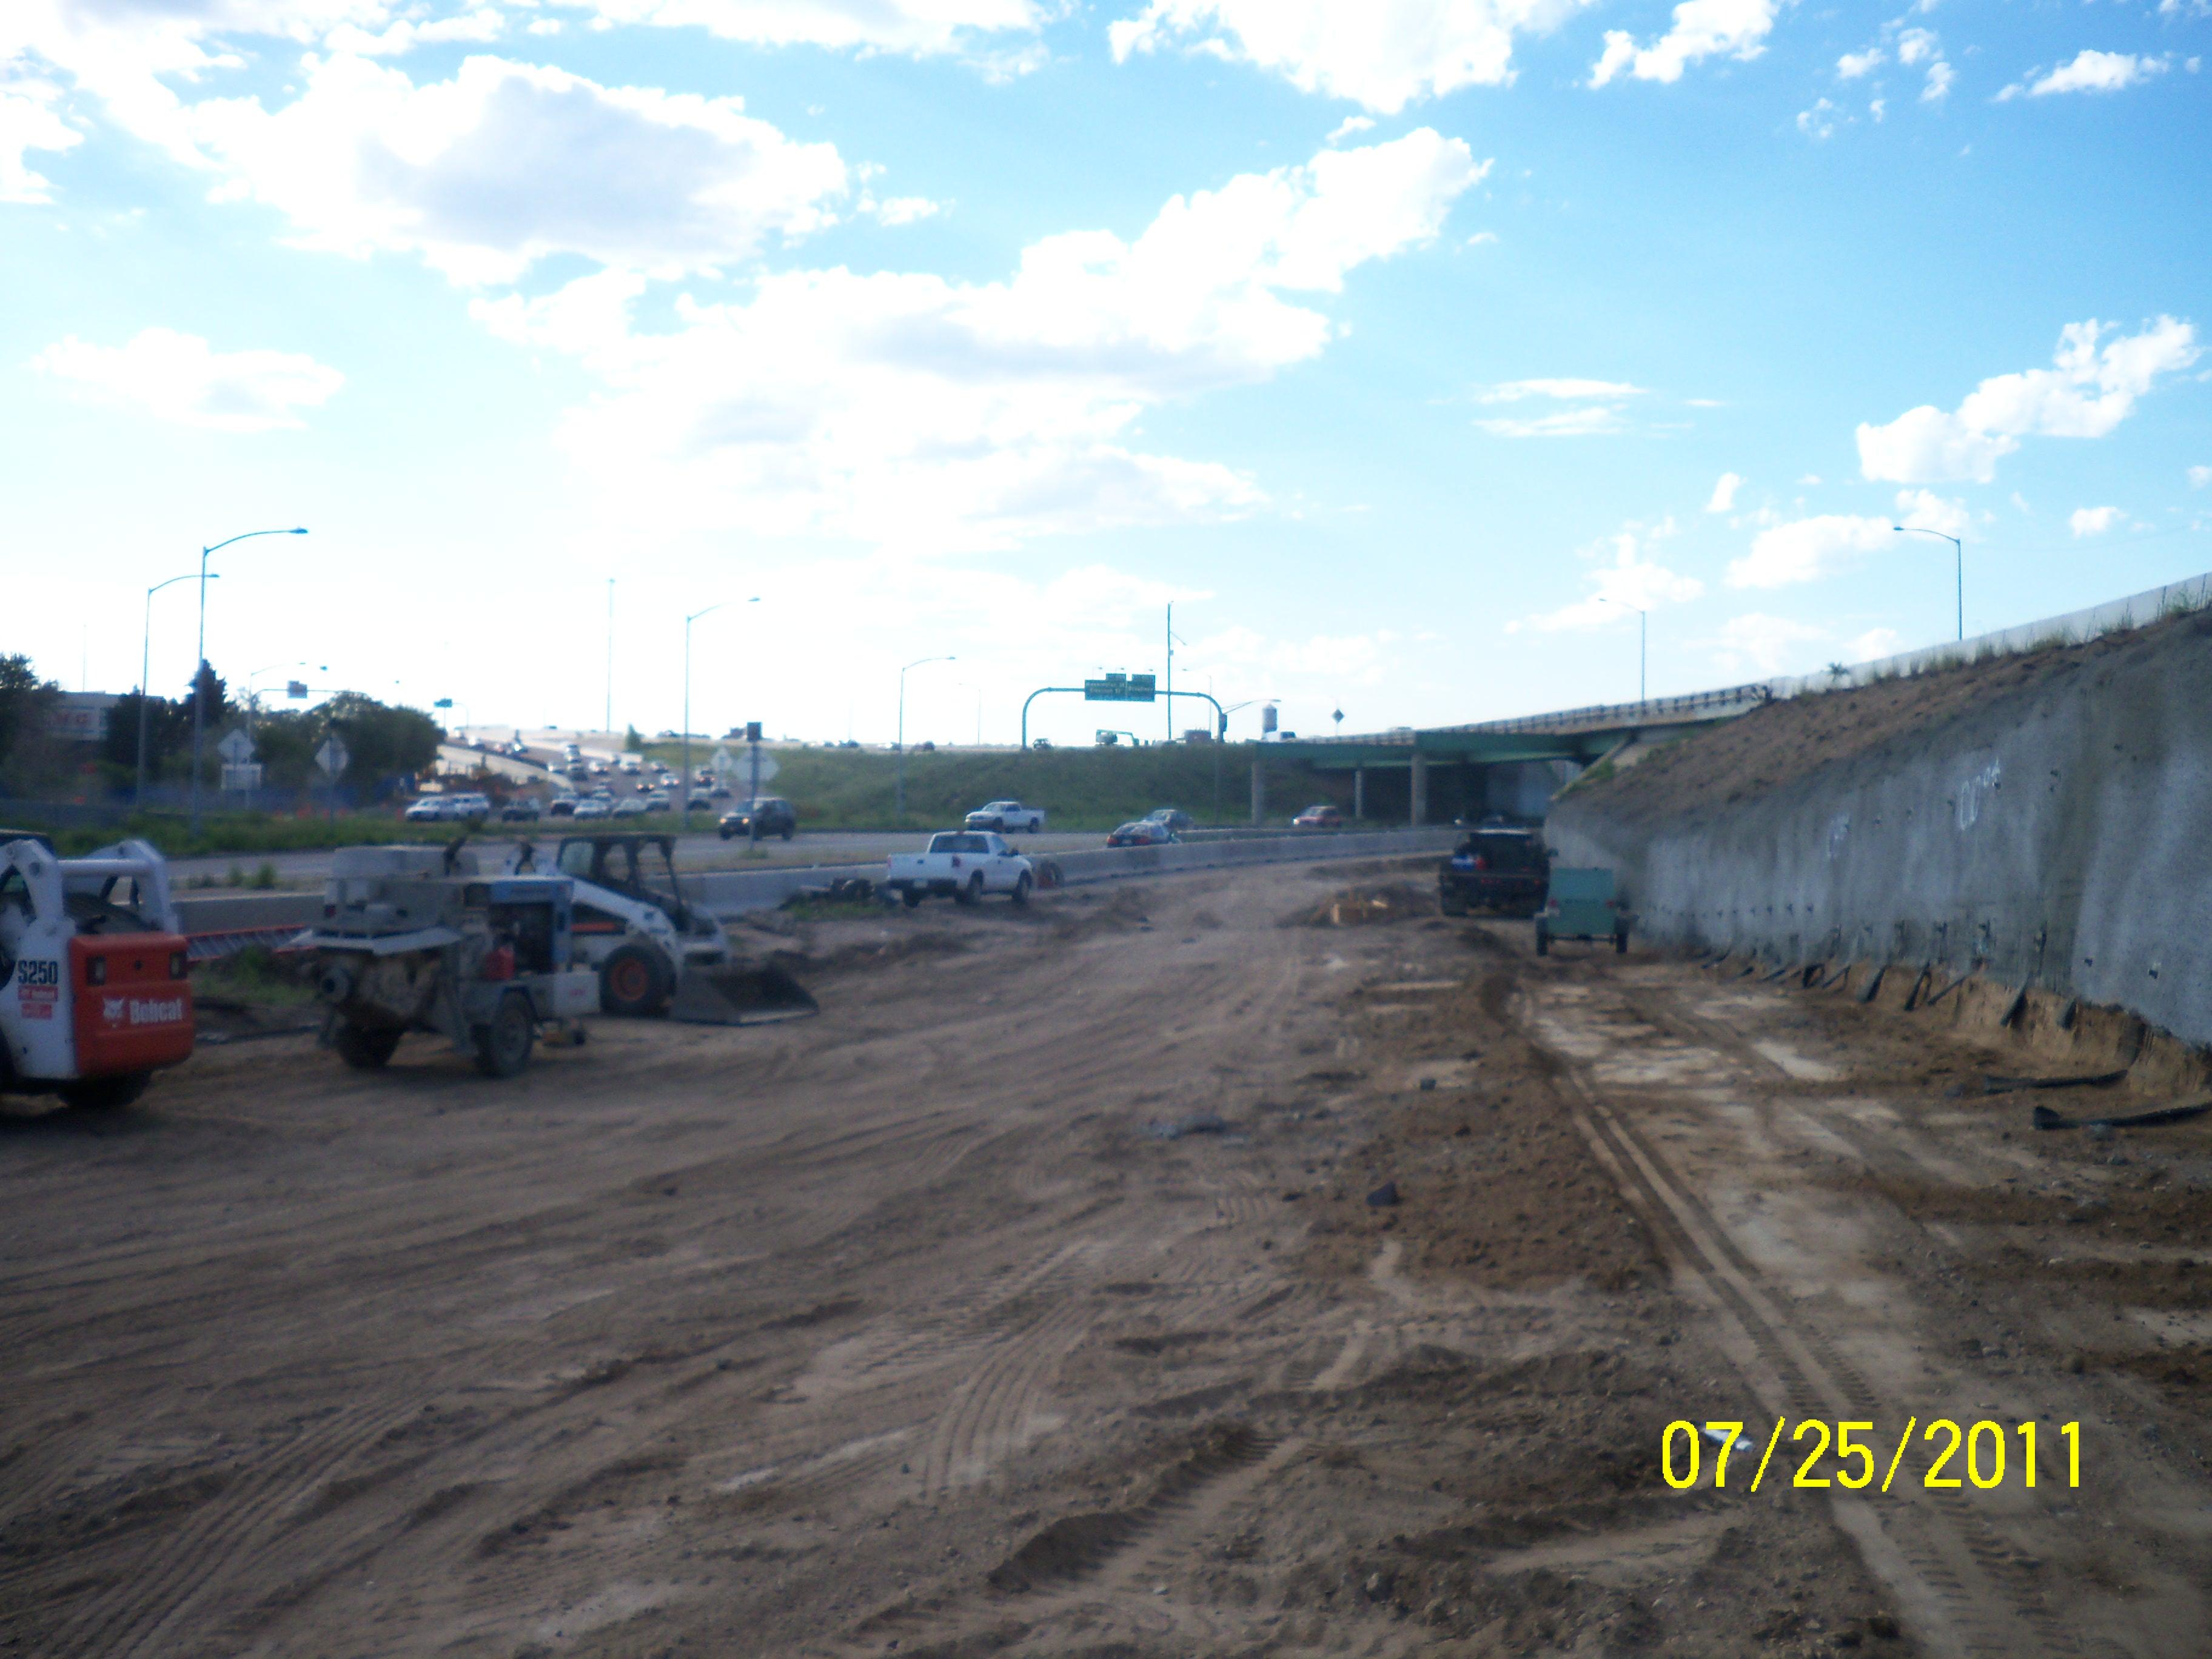 I-25 Santa Fe Pic 3 detail image